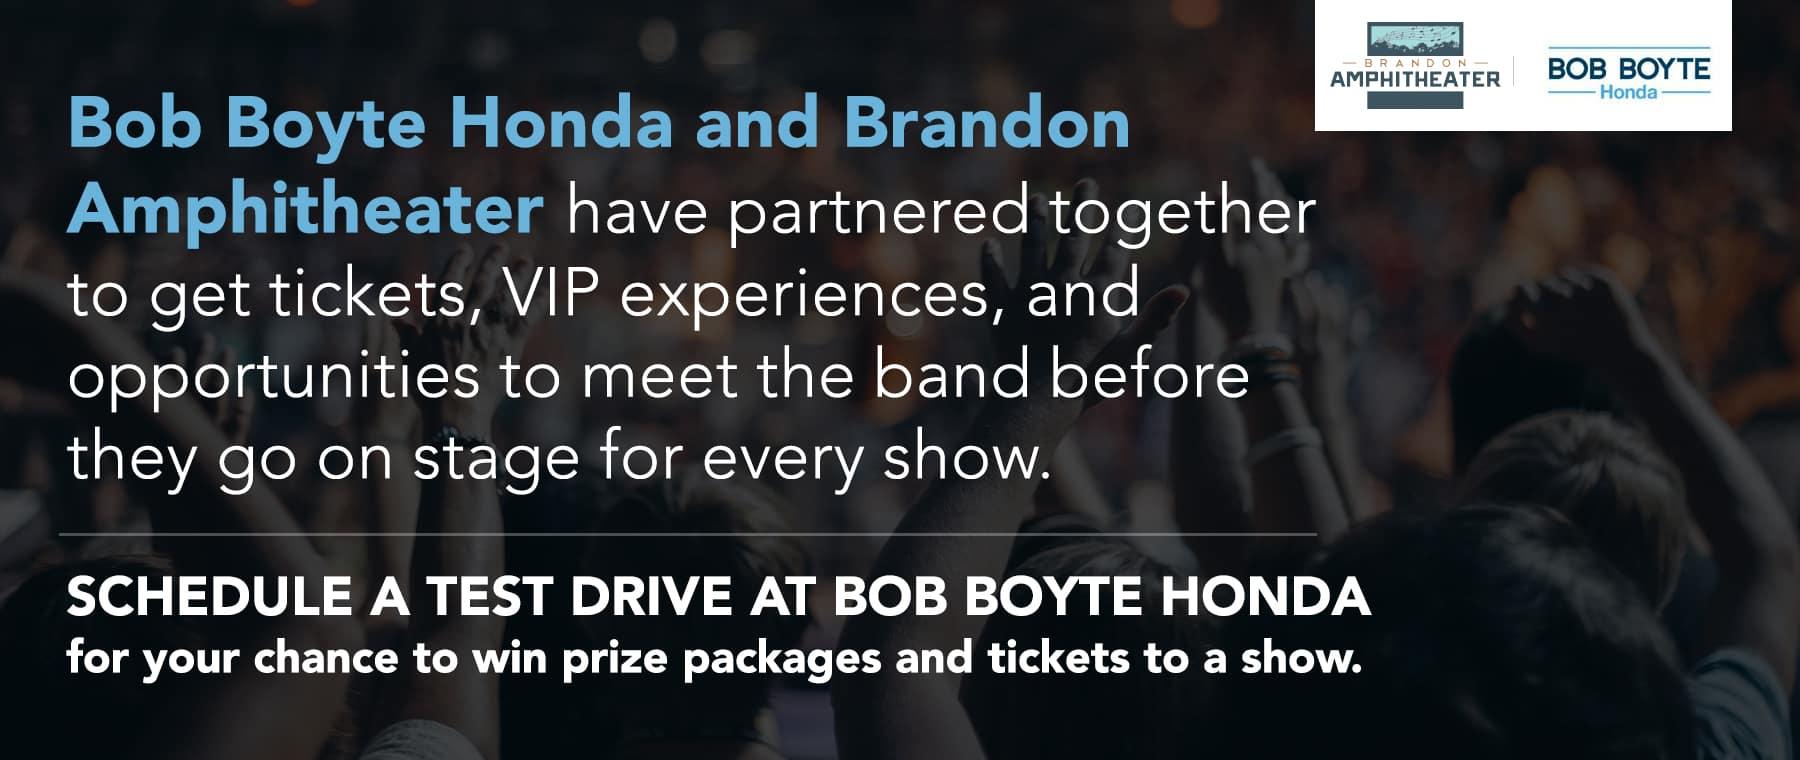 Brandon Amphitheater and Bob Boyte Honda